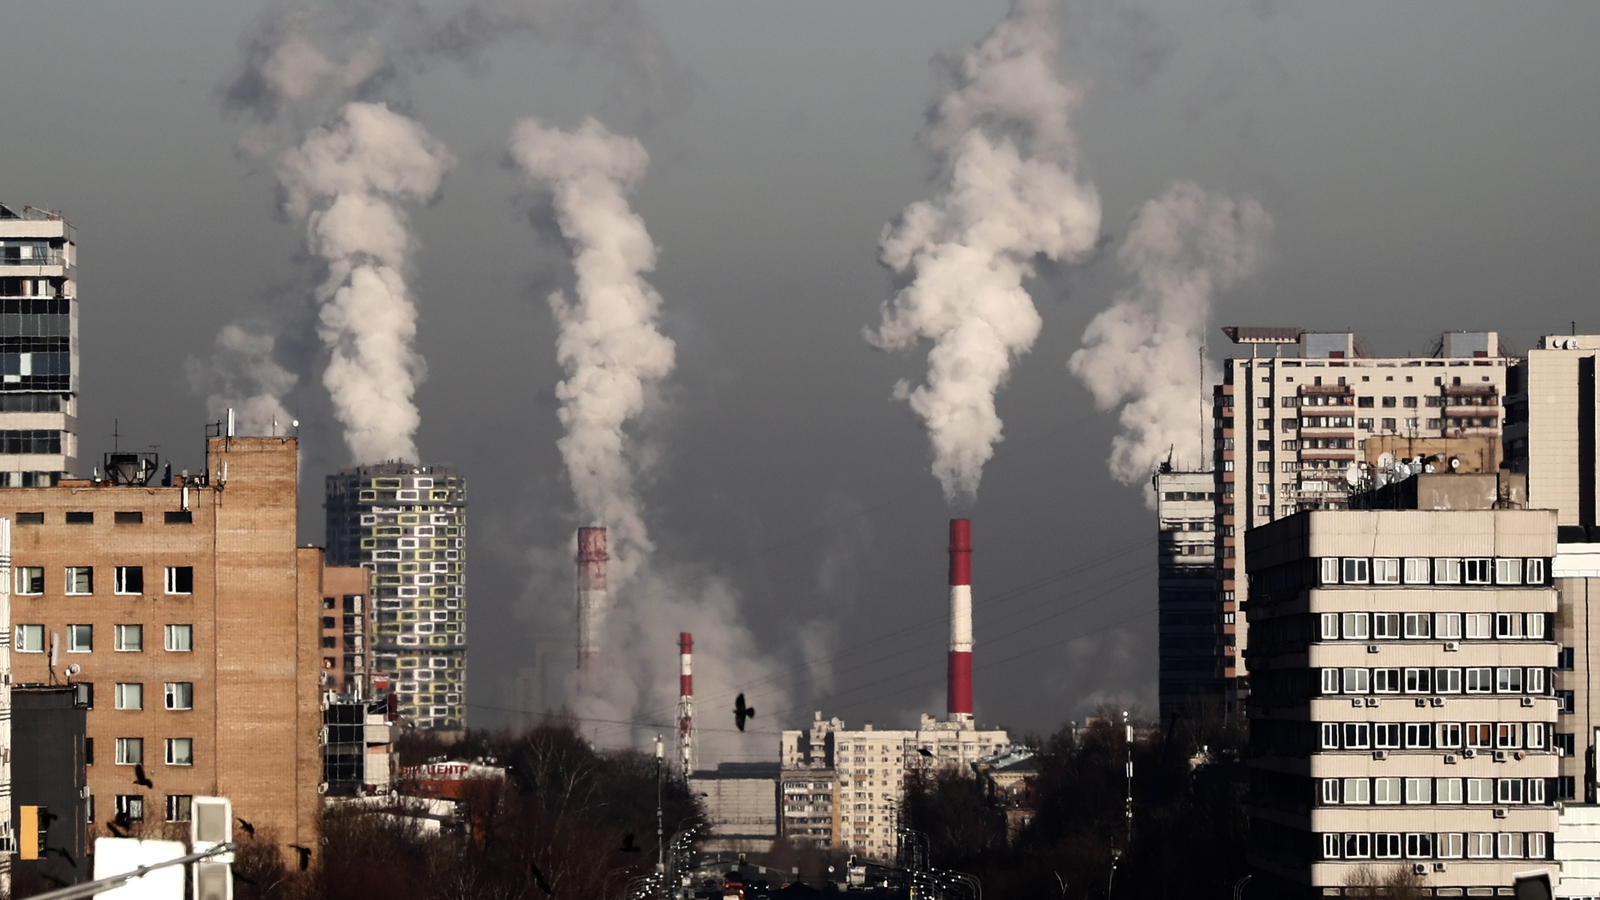 EU declares climate emergency ahead of summit